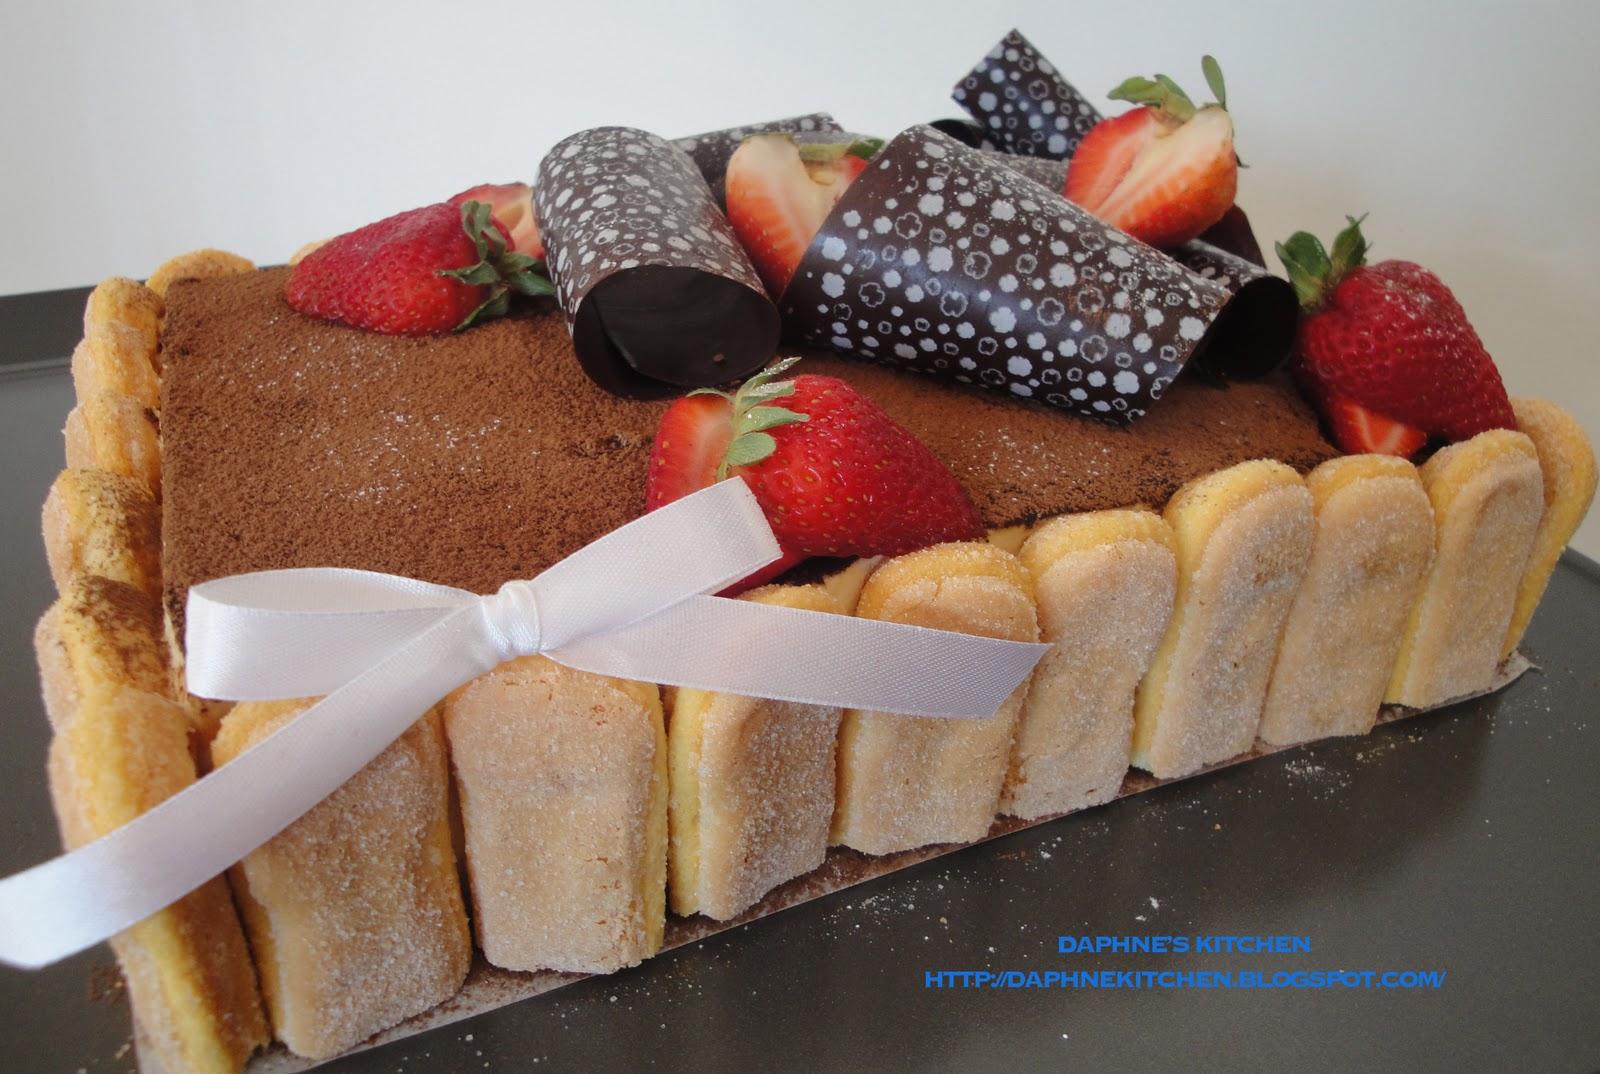 Daphne's Kitchen: Tiramisu Cake on